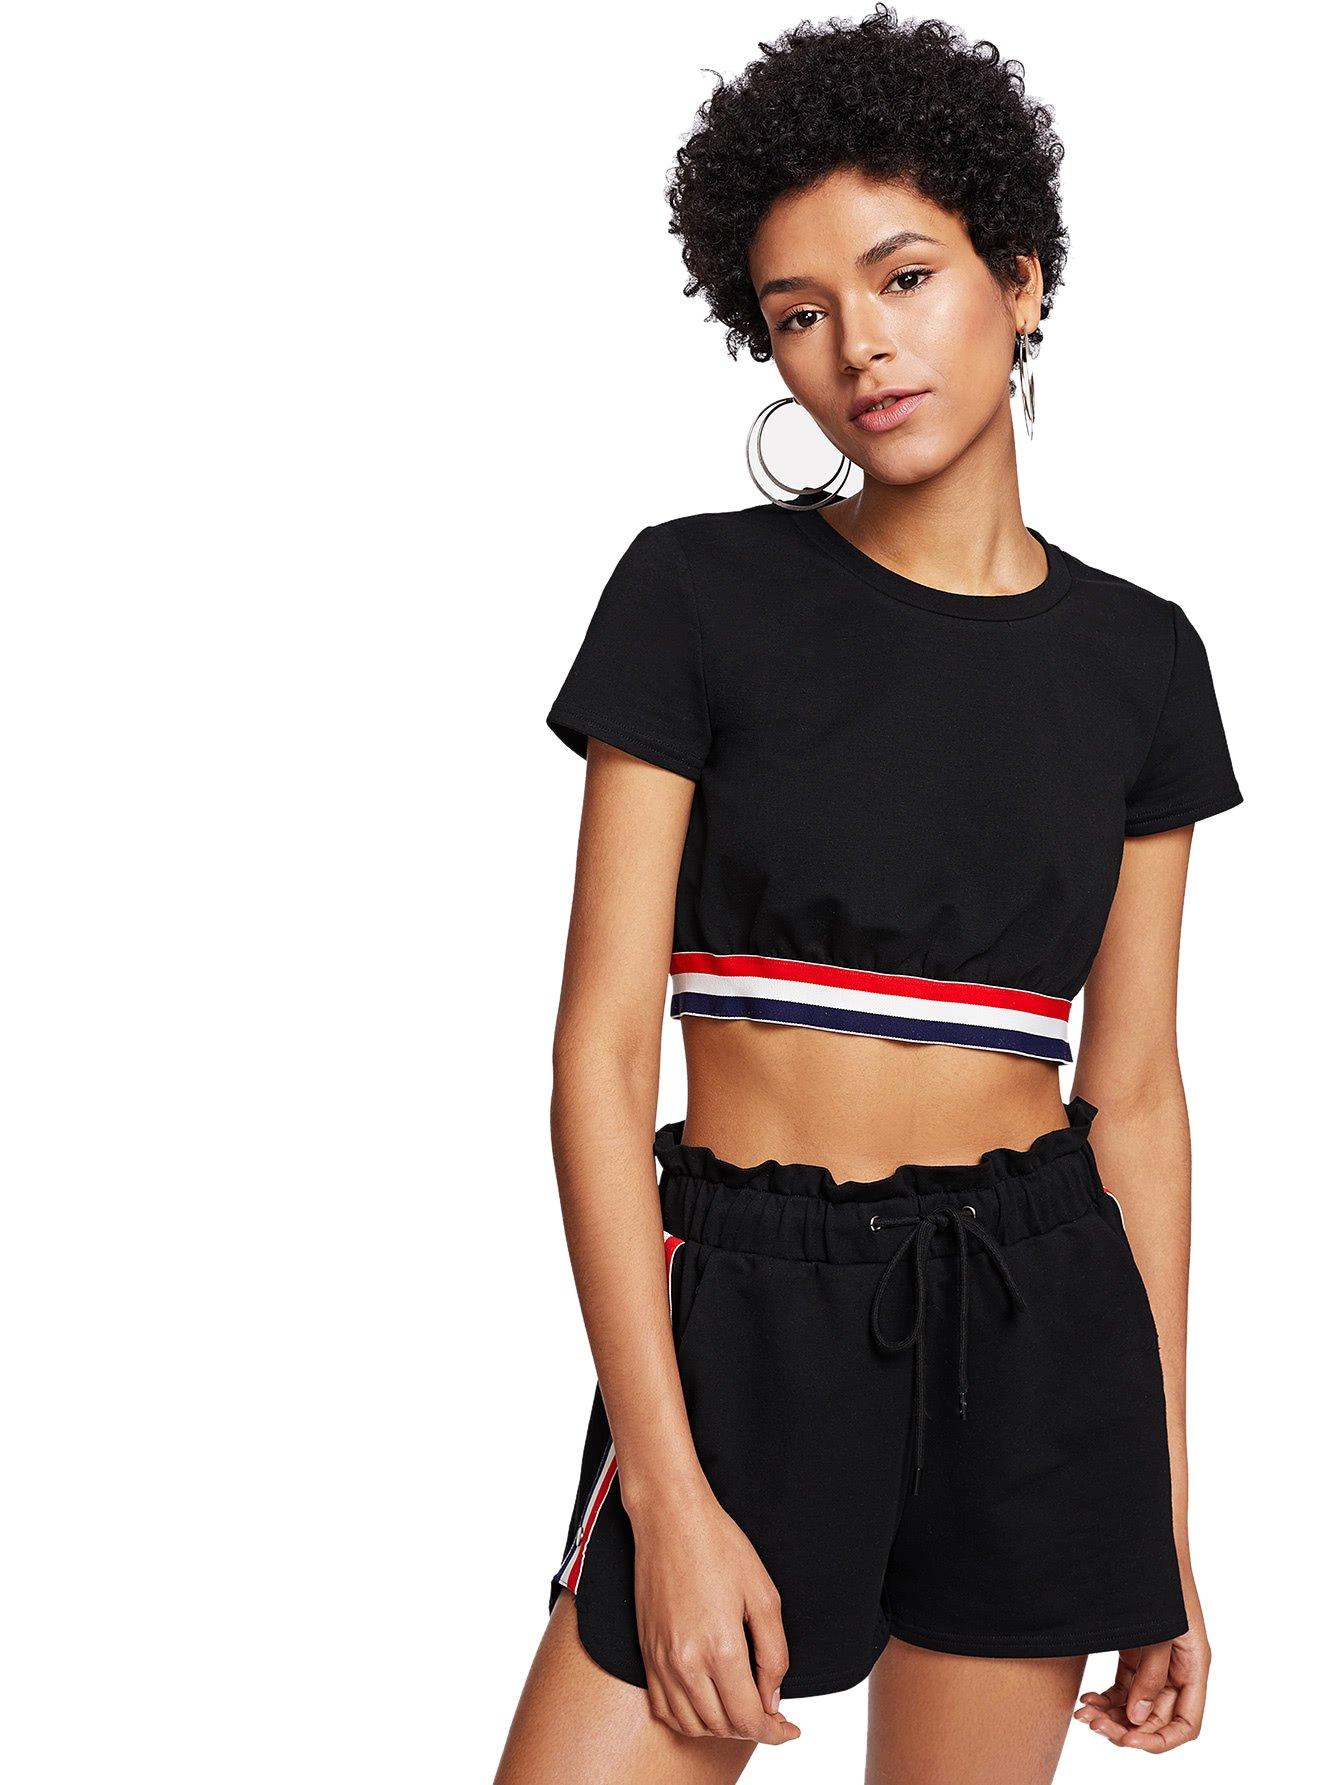 SweatyRocks Women's Crop Top T shirt Elastic Waist Shorts Set 2 Piece Outfit Suit Black XL